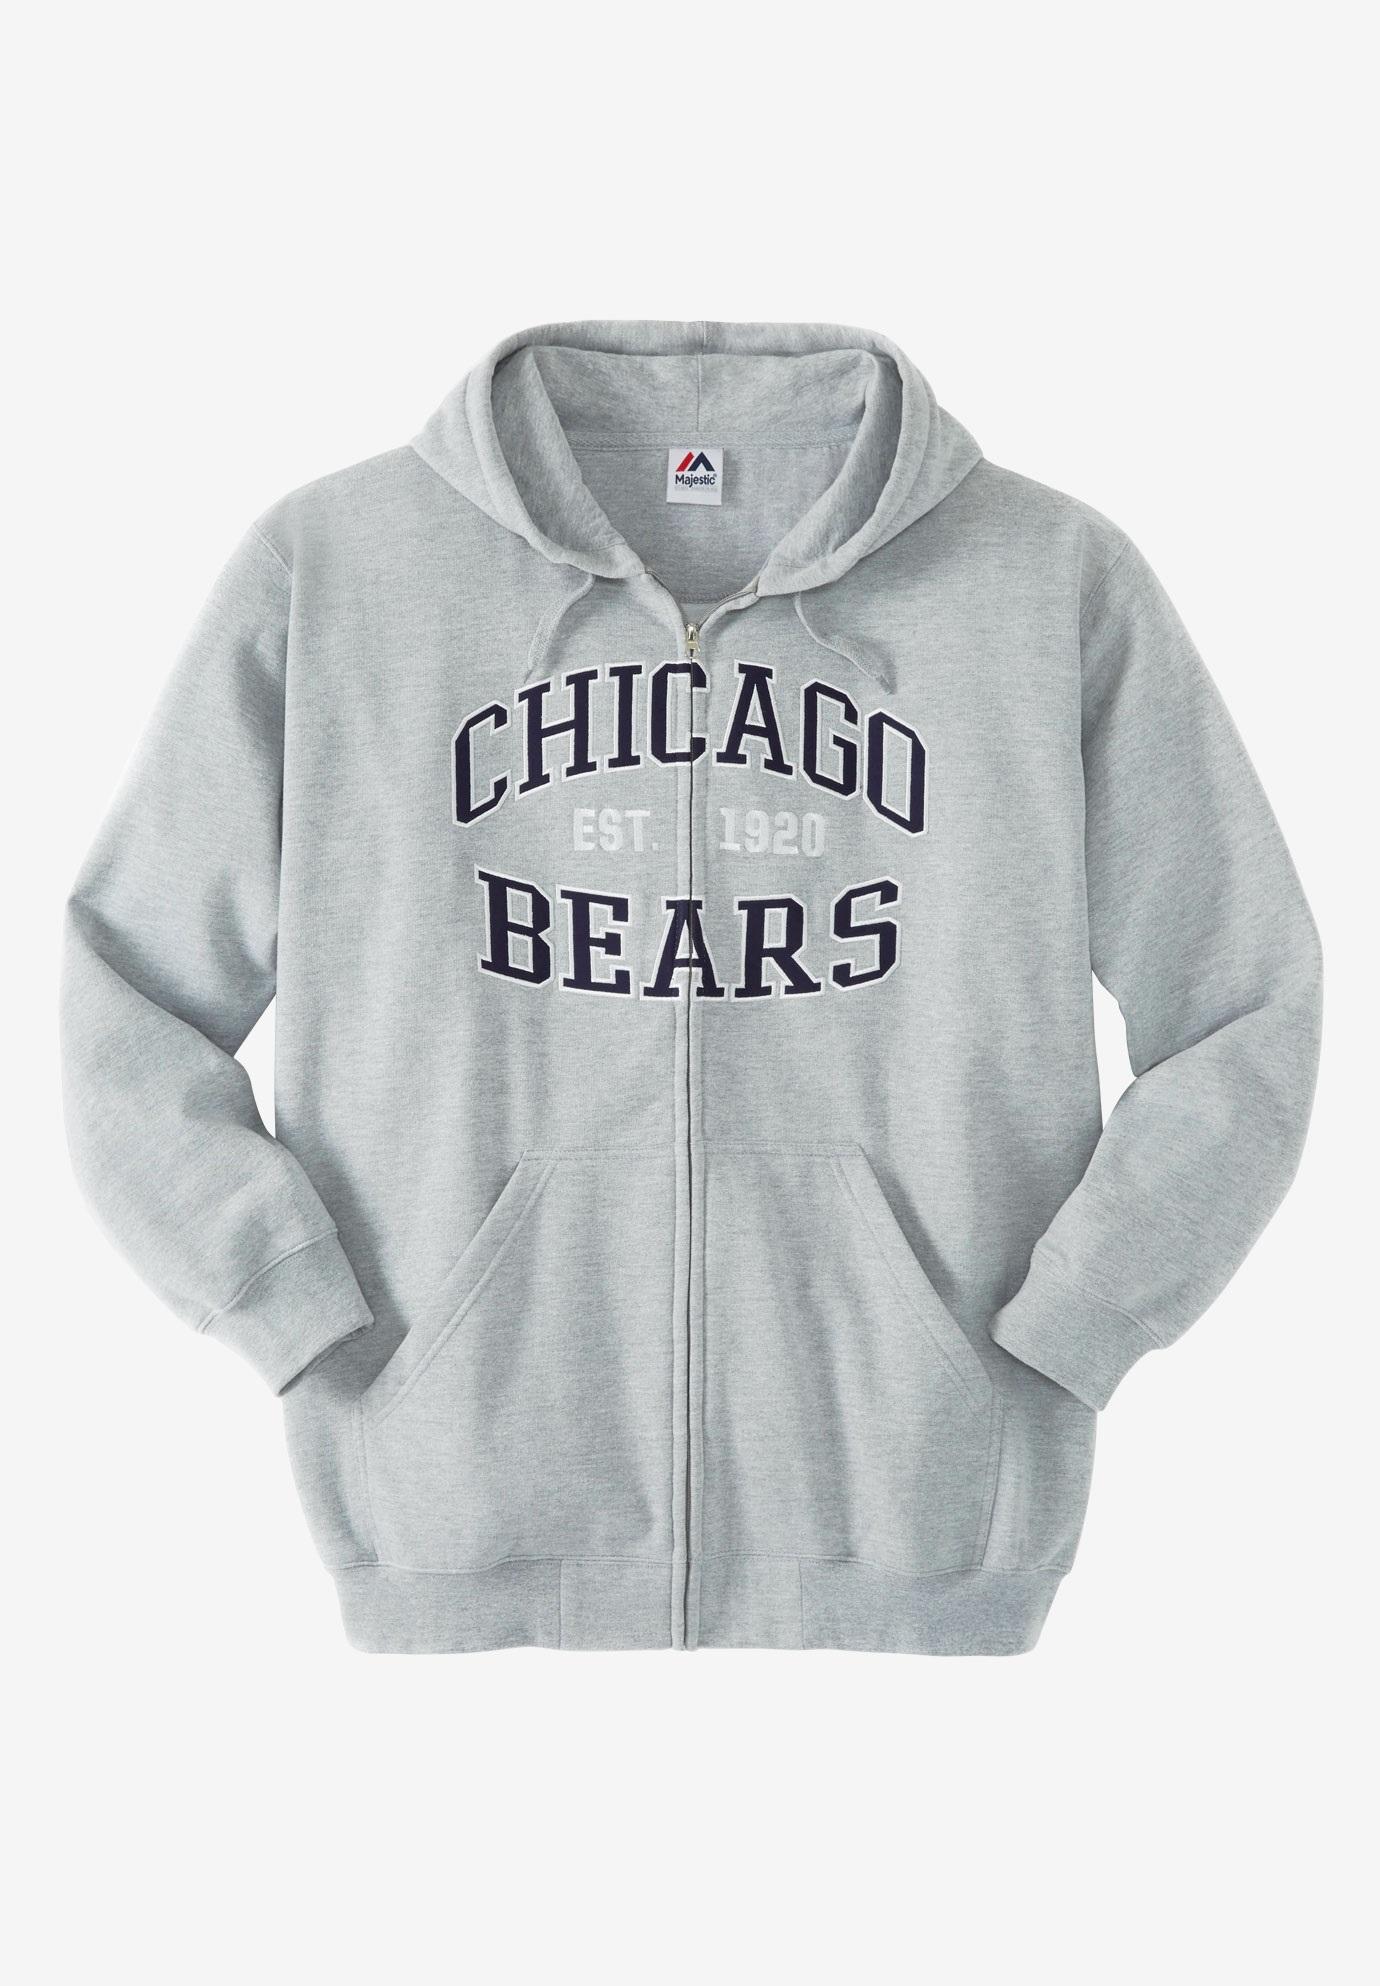 new products 90bfa 387a9 NFL® Fleece Full-Zip Hoodie